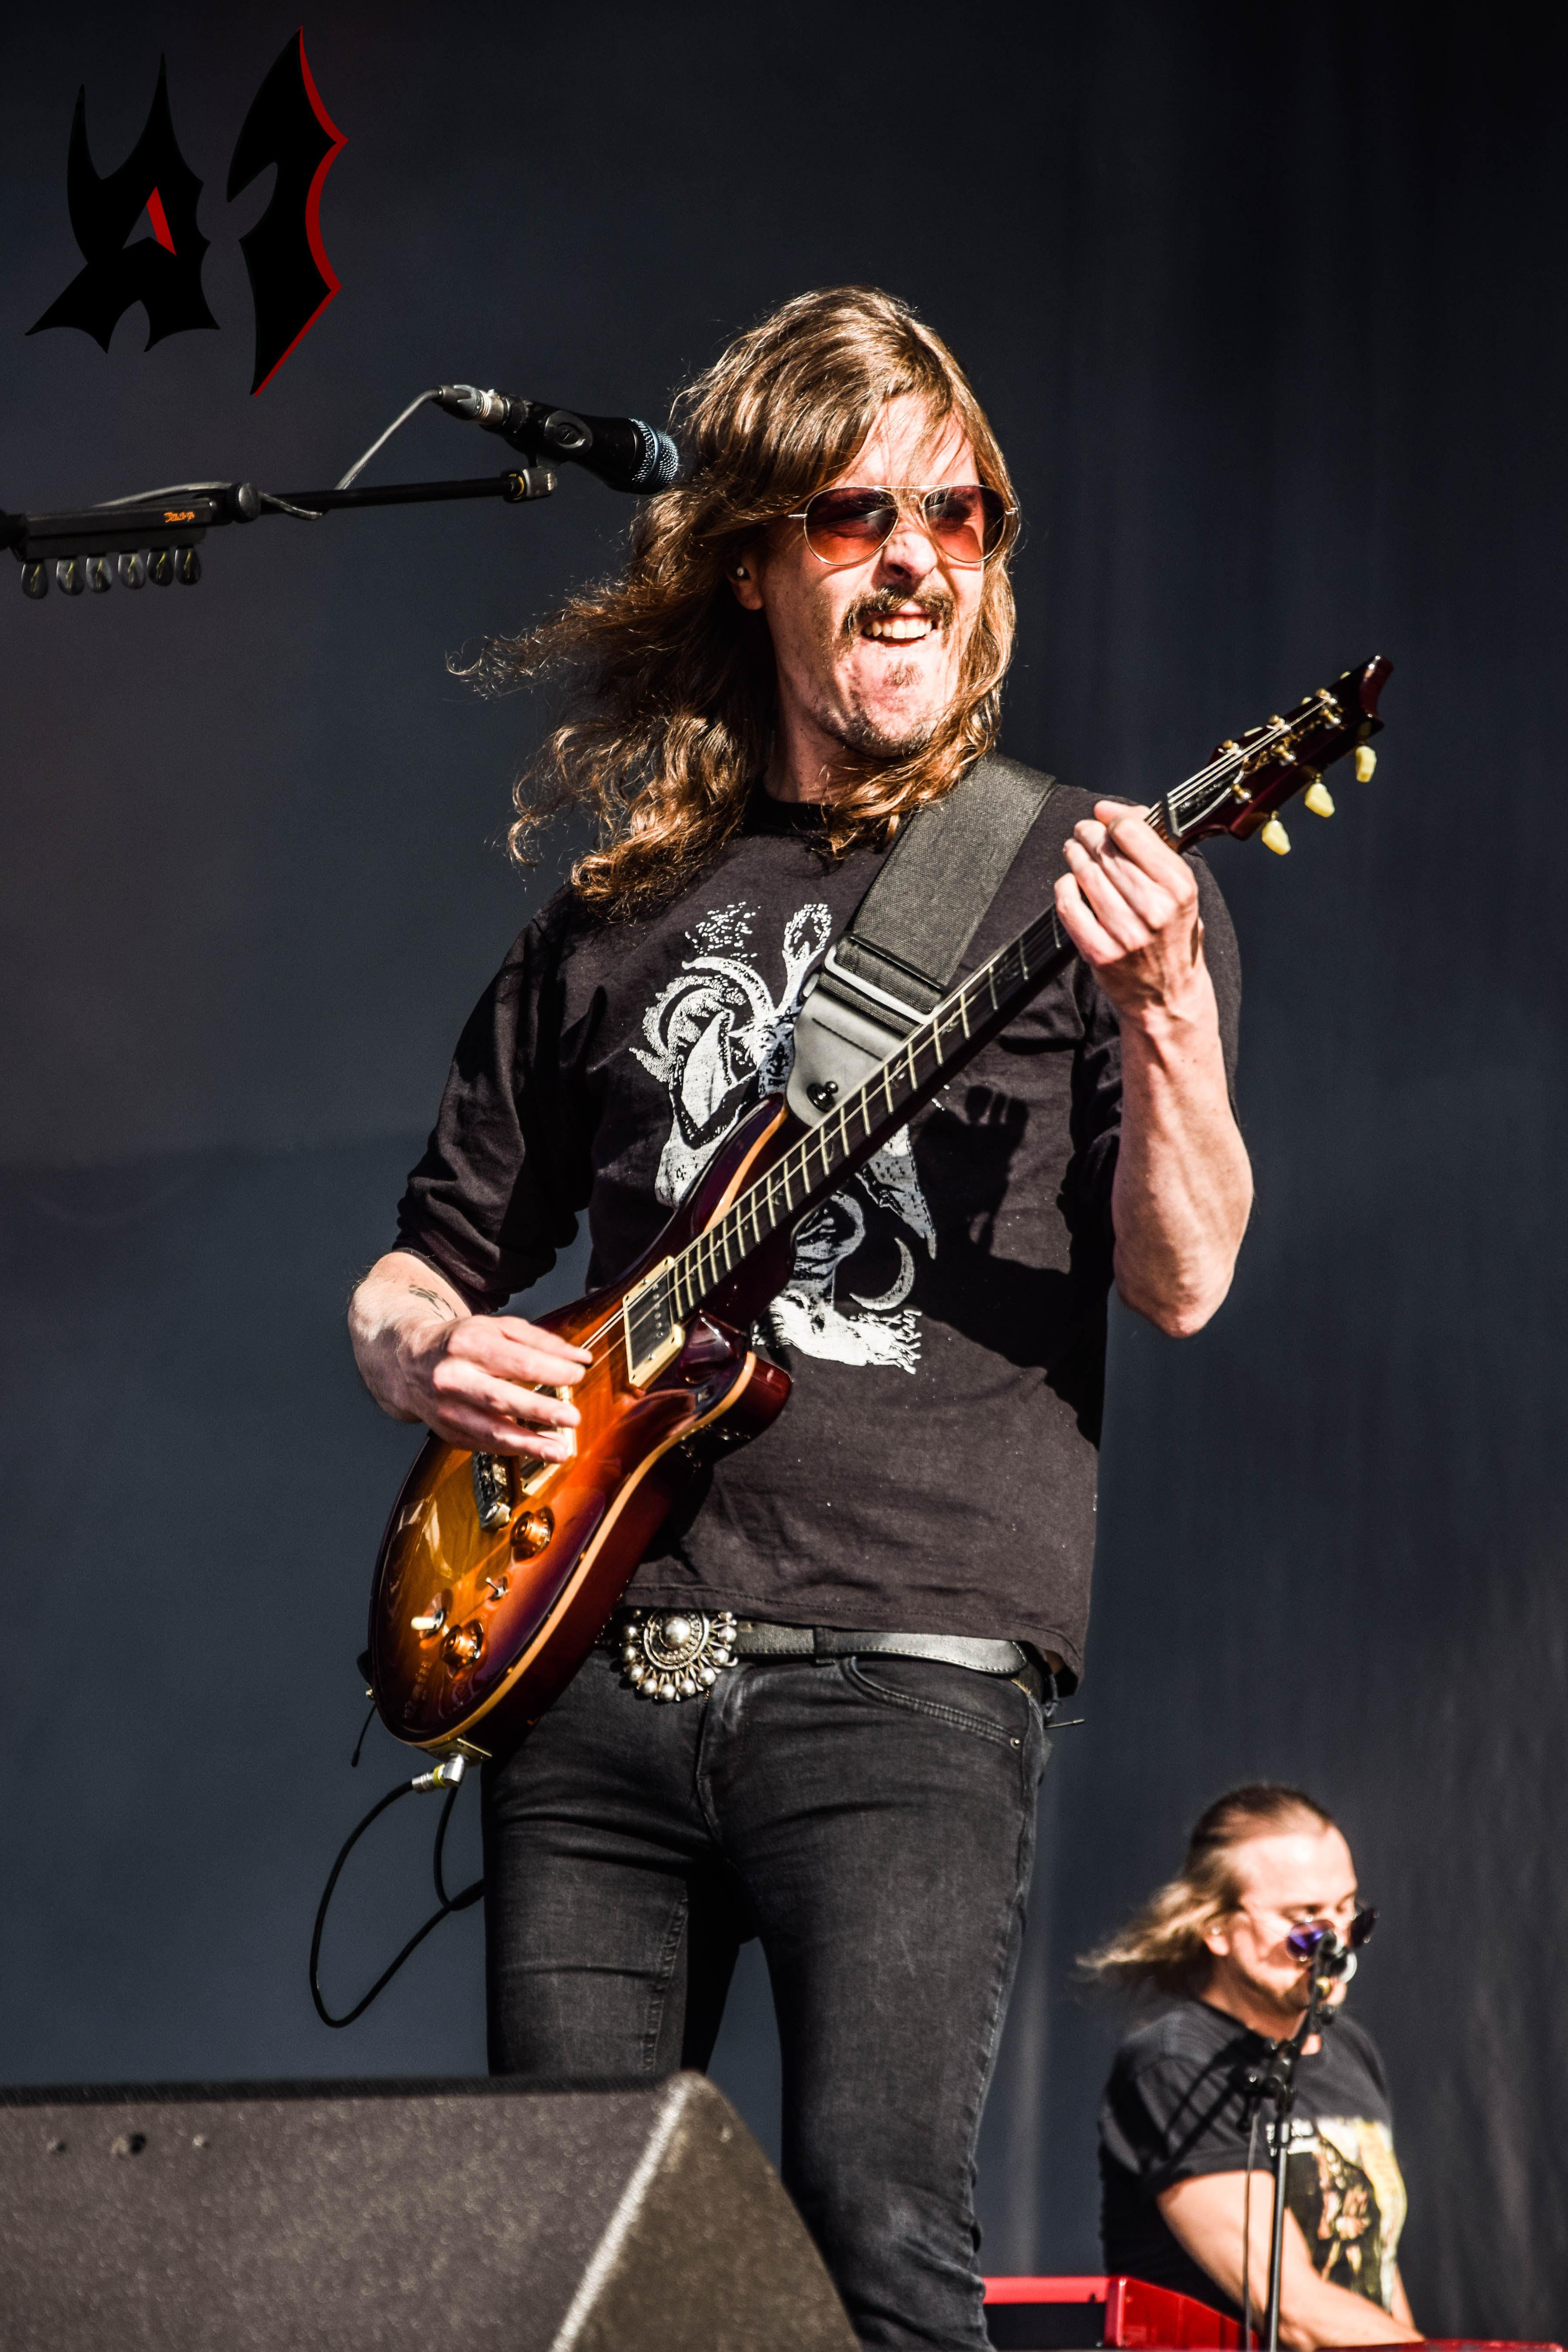 Donwload 2018 – Day 1 - Opeth 4